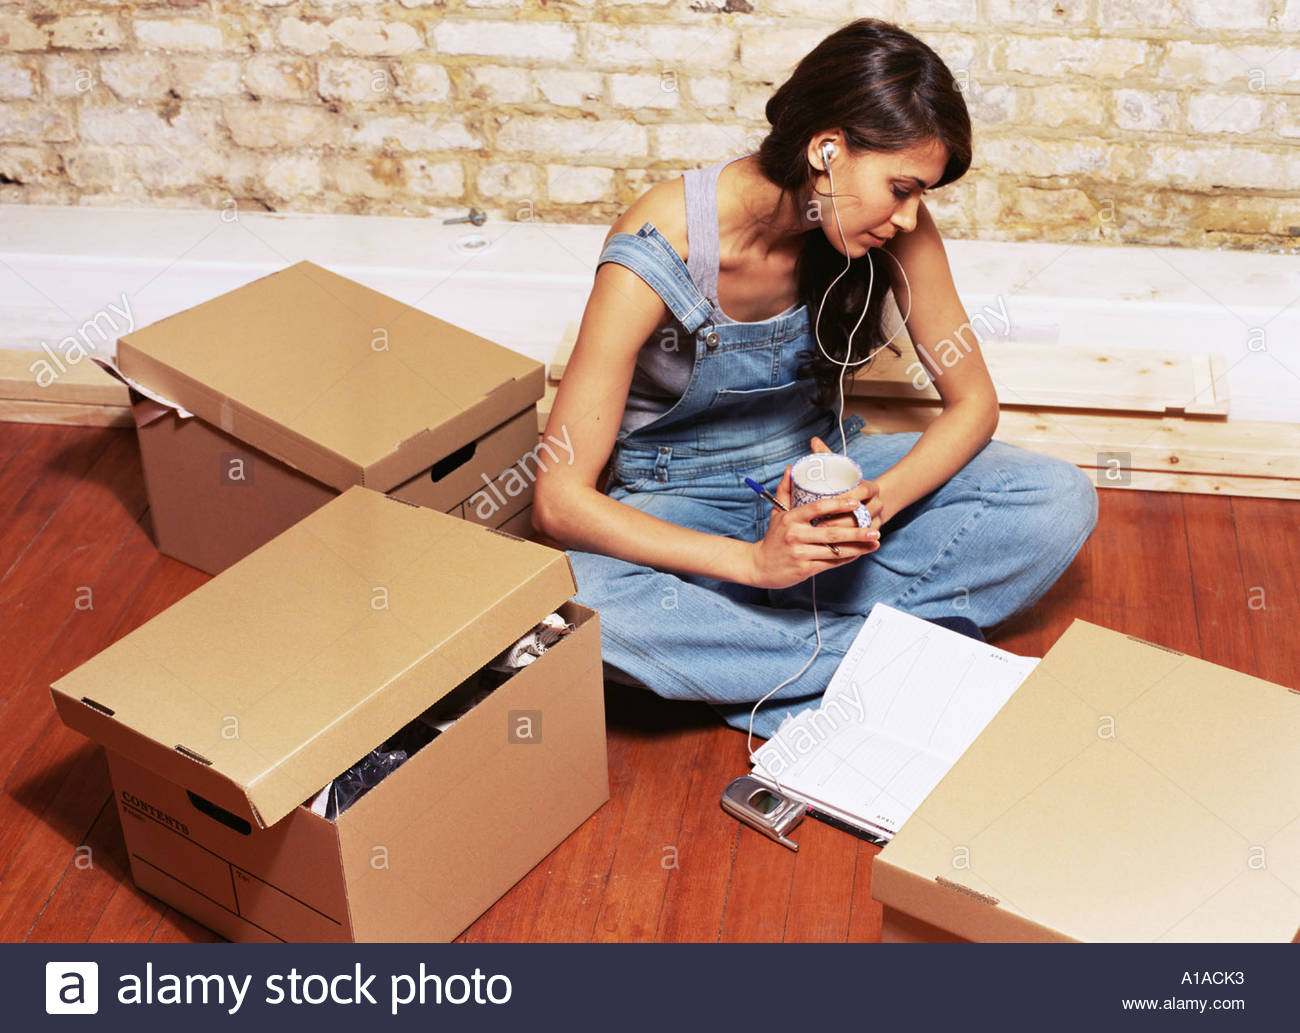 Woman preparing to decorate - Stock Image